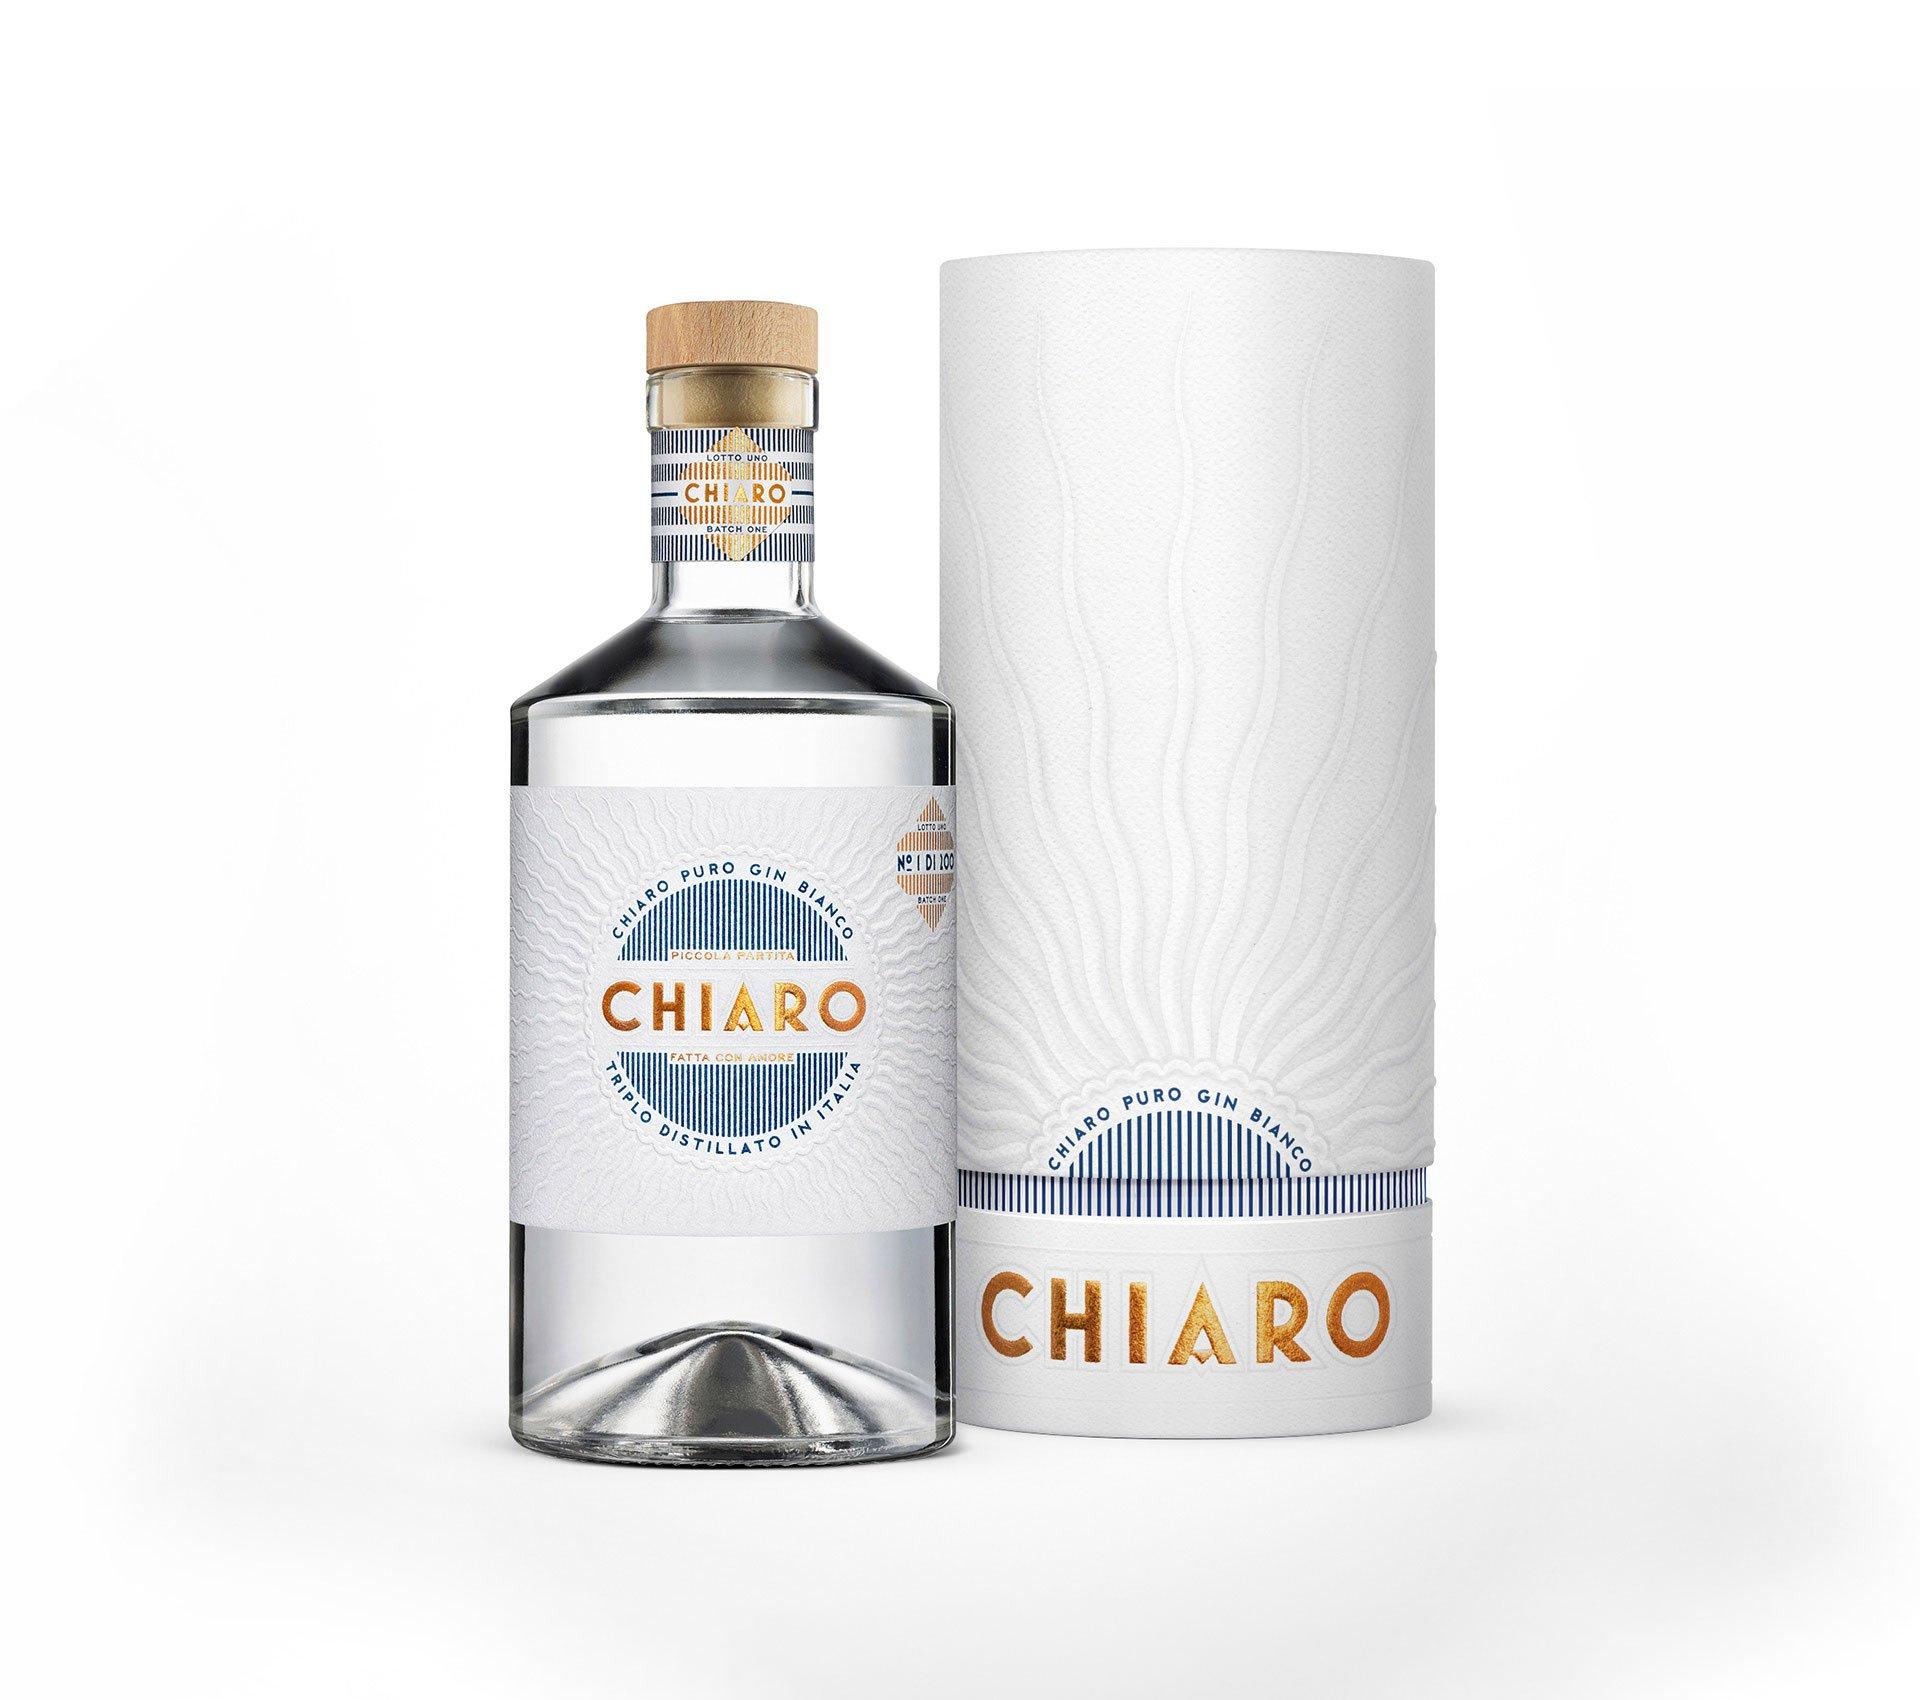 Chiaro Gin by Harcus Design, Jaimee-Lee Field, Annette Harcus